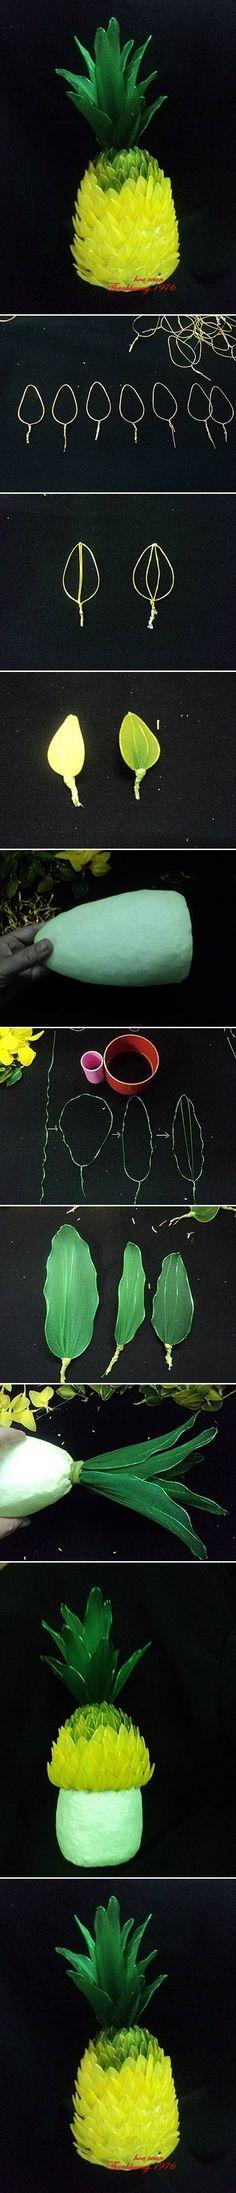 DIY Nylon Pineapple DIY Projects | UsefulDIY.com